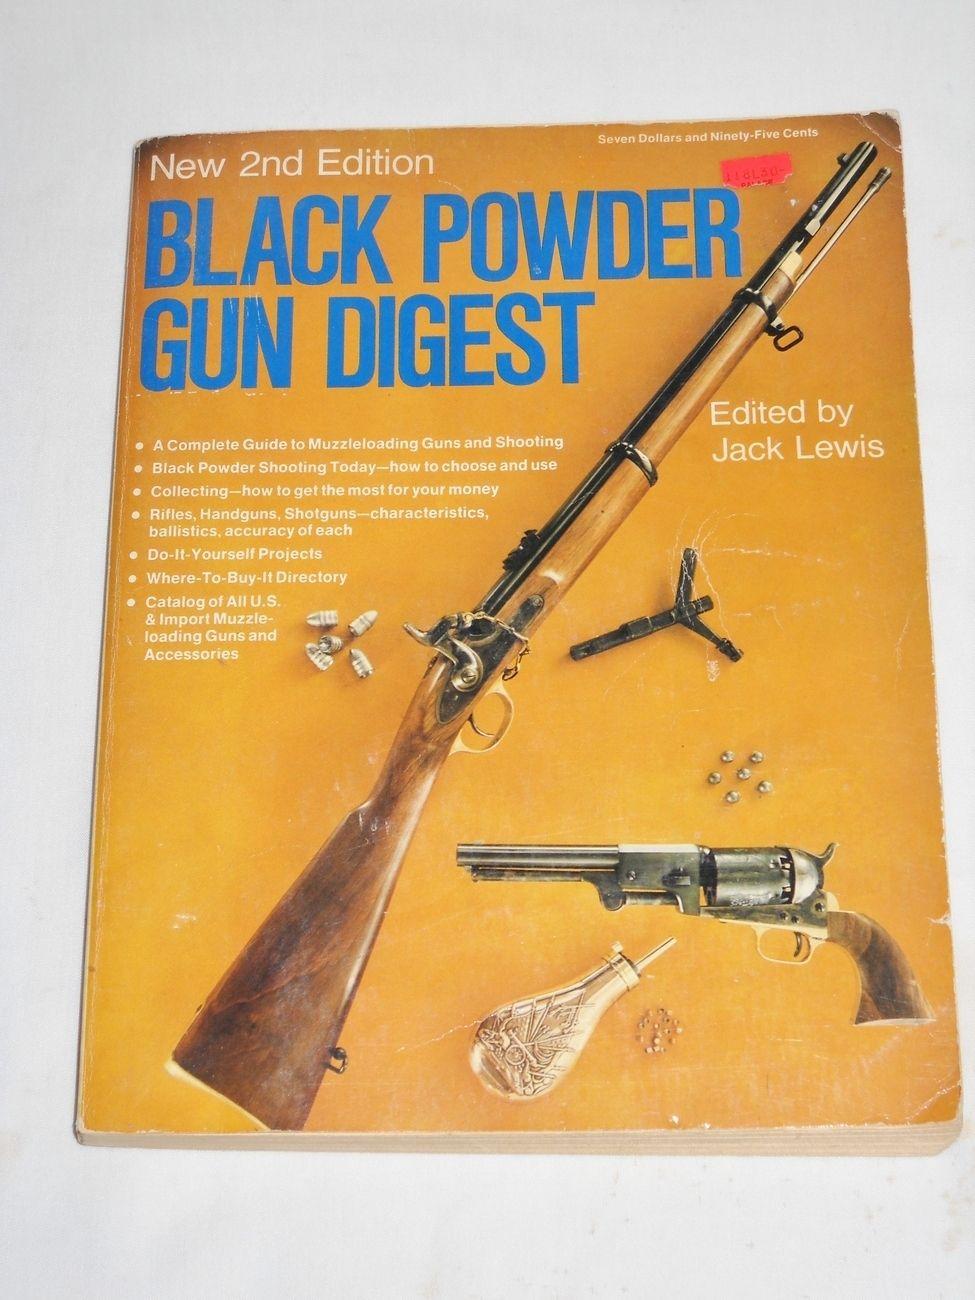 Black Powder Gun Digest | books | Black powder guns, Black, Guns